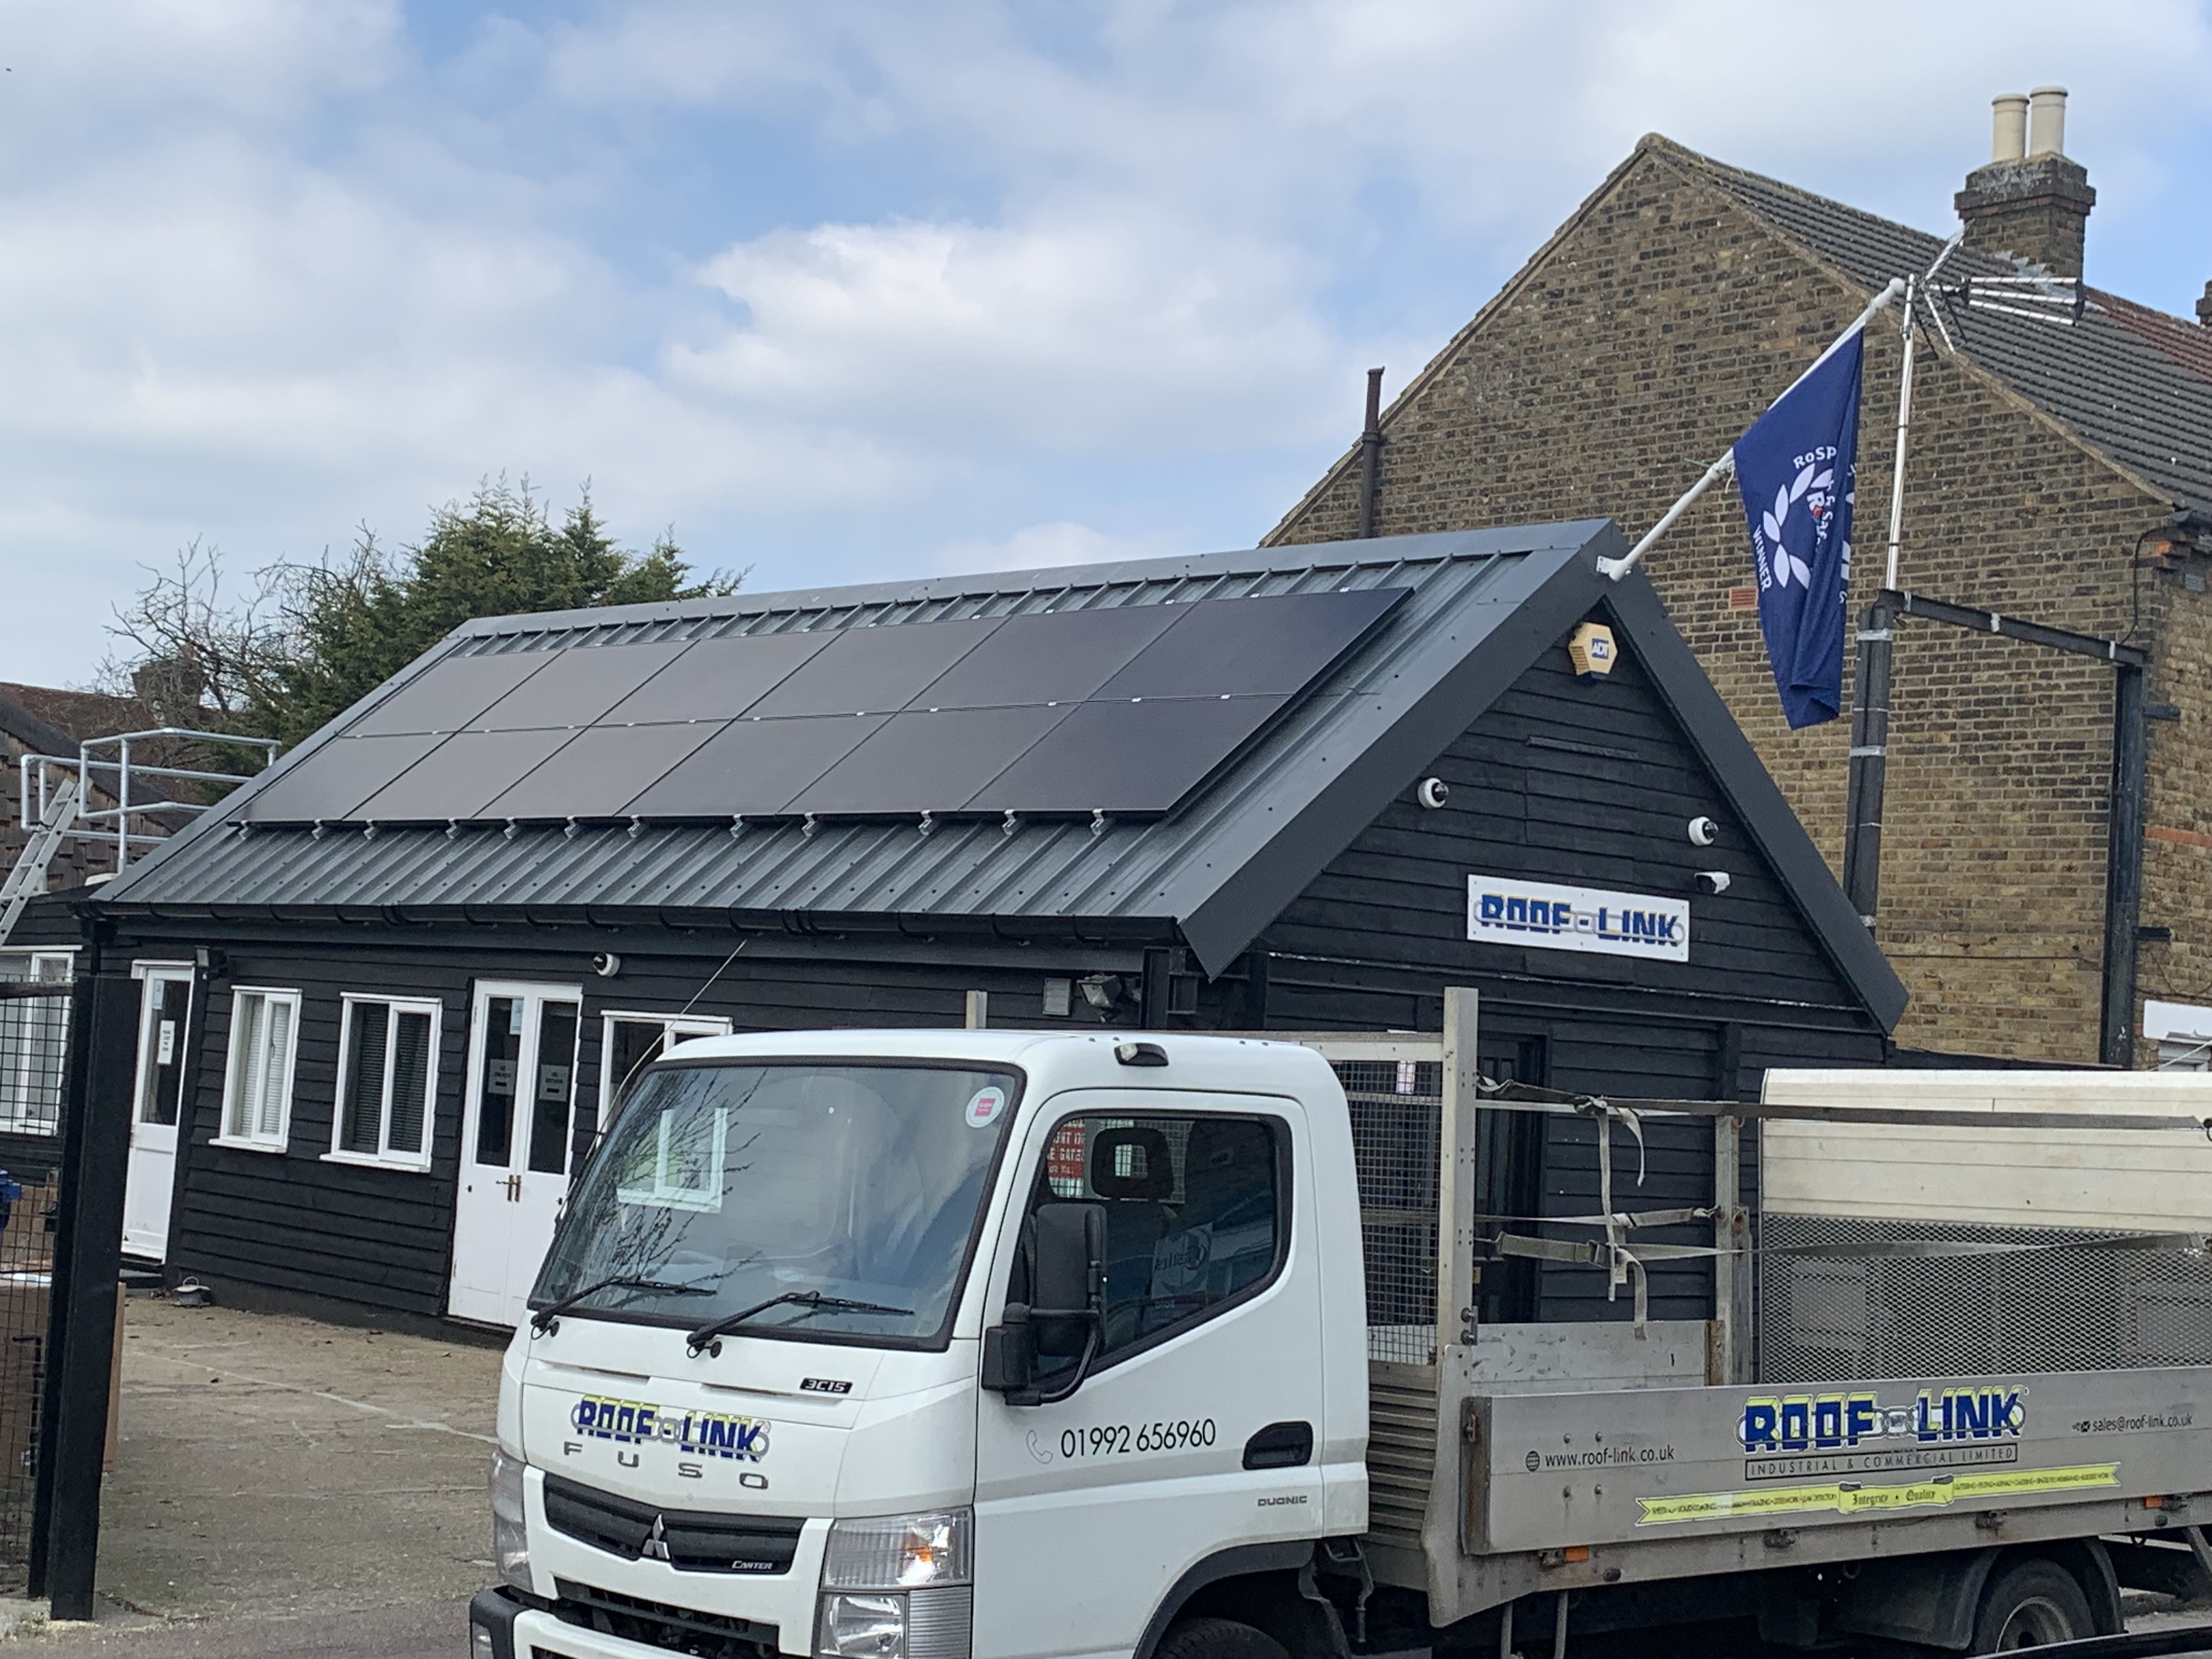 Solar Panels/Tesla Powerwall/Air Source Heat Pump | | Roof Link